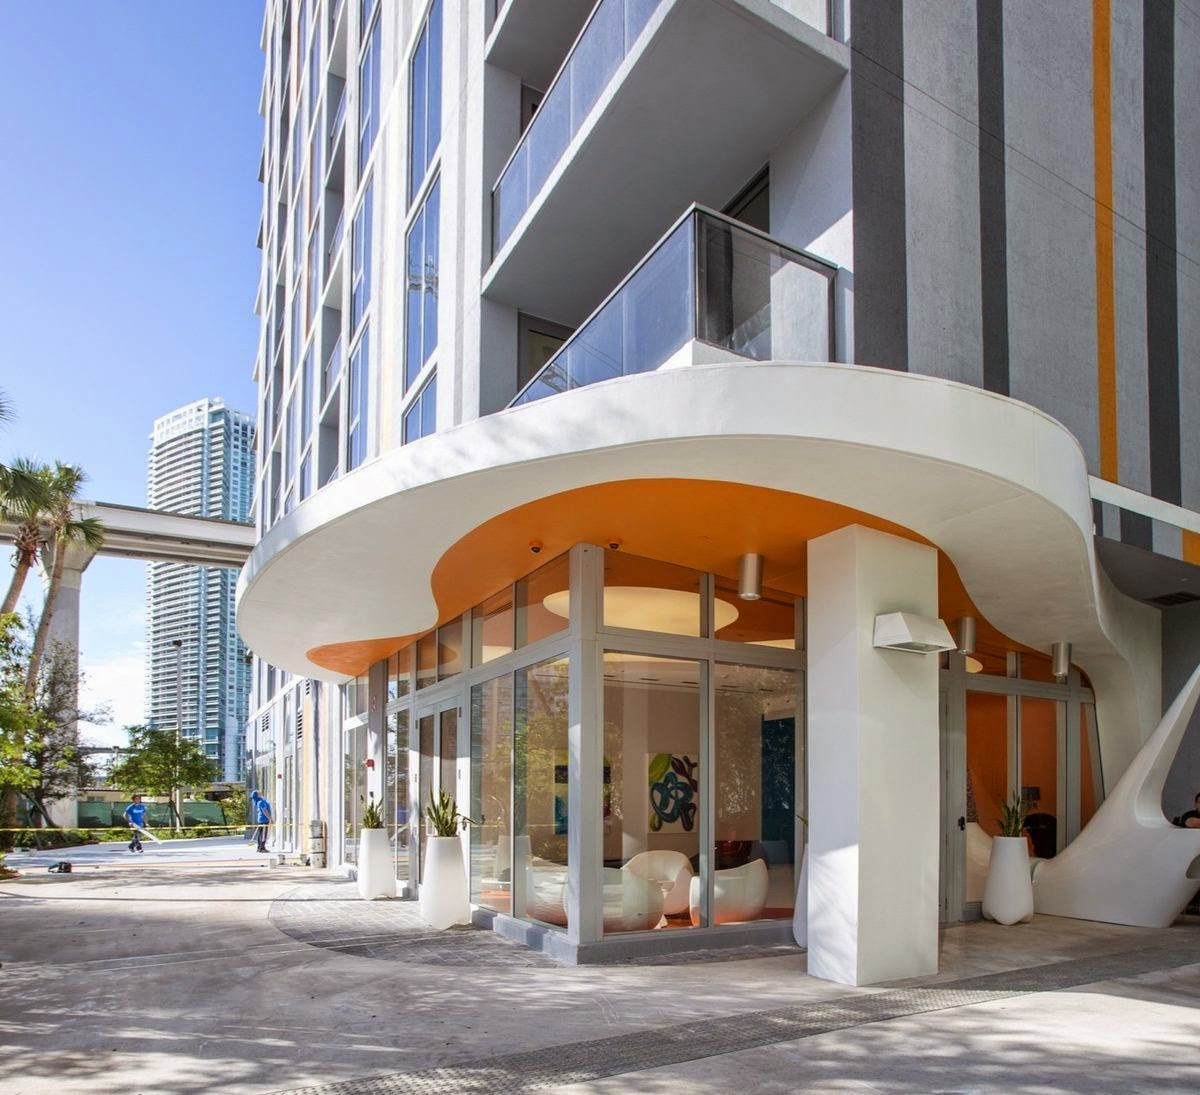 Apartment For Rent In Miami: Miami Riches Real Estate Blog: November 2014